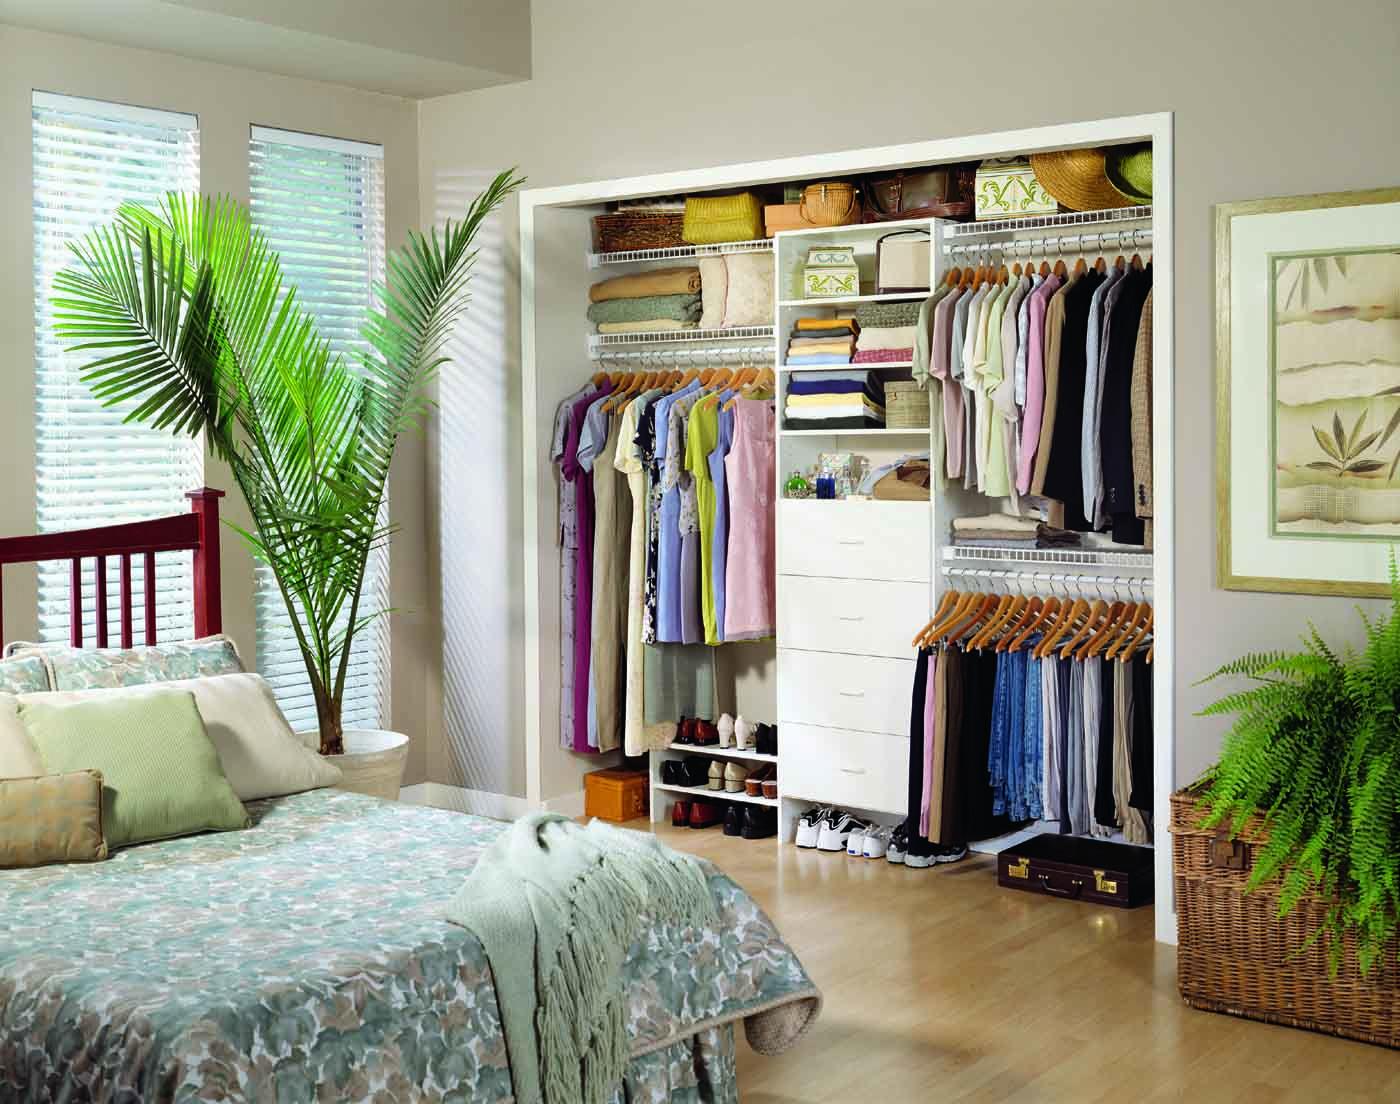 Creative Way To Customize Your Closet Space!